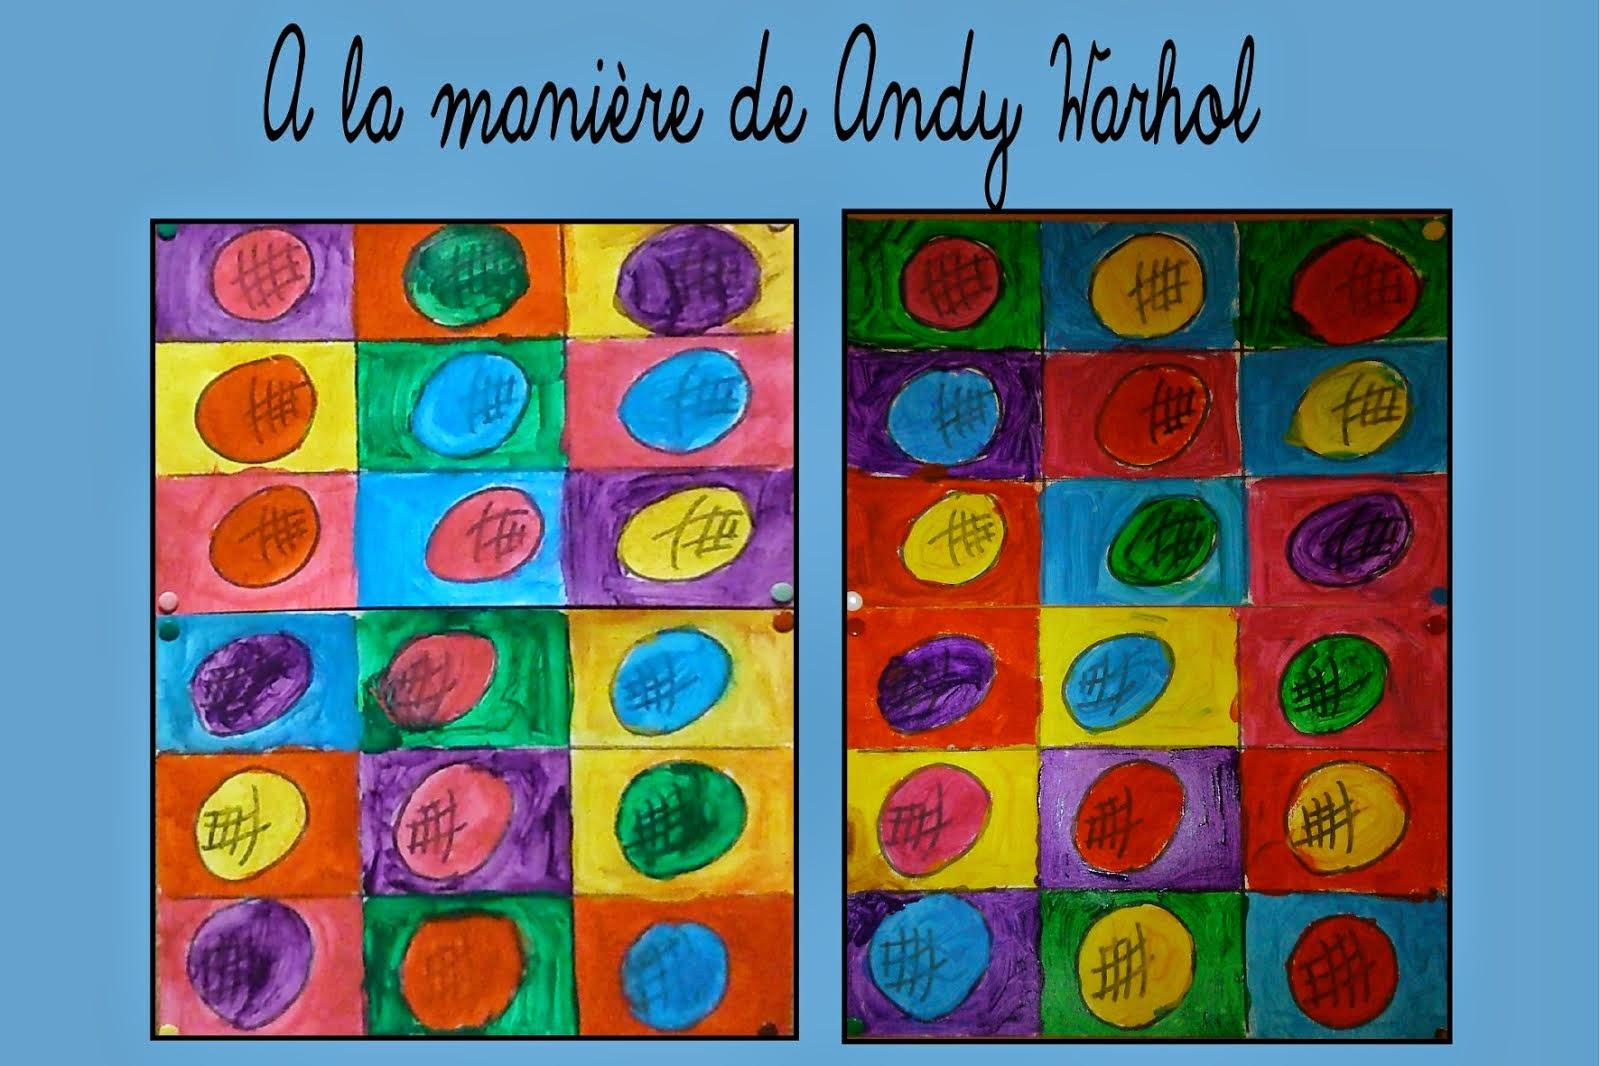 Inspirés par Andy Warhol